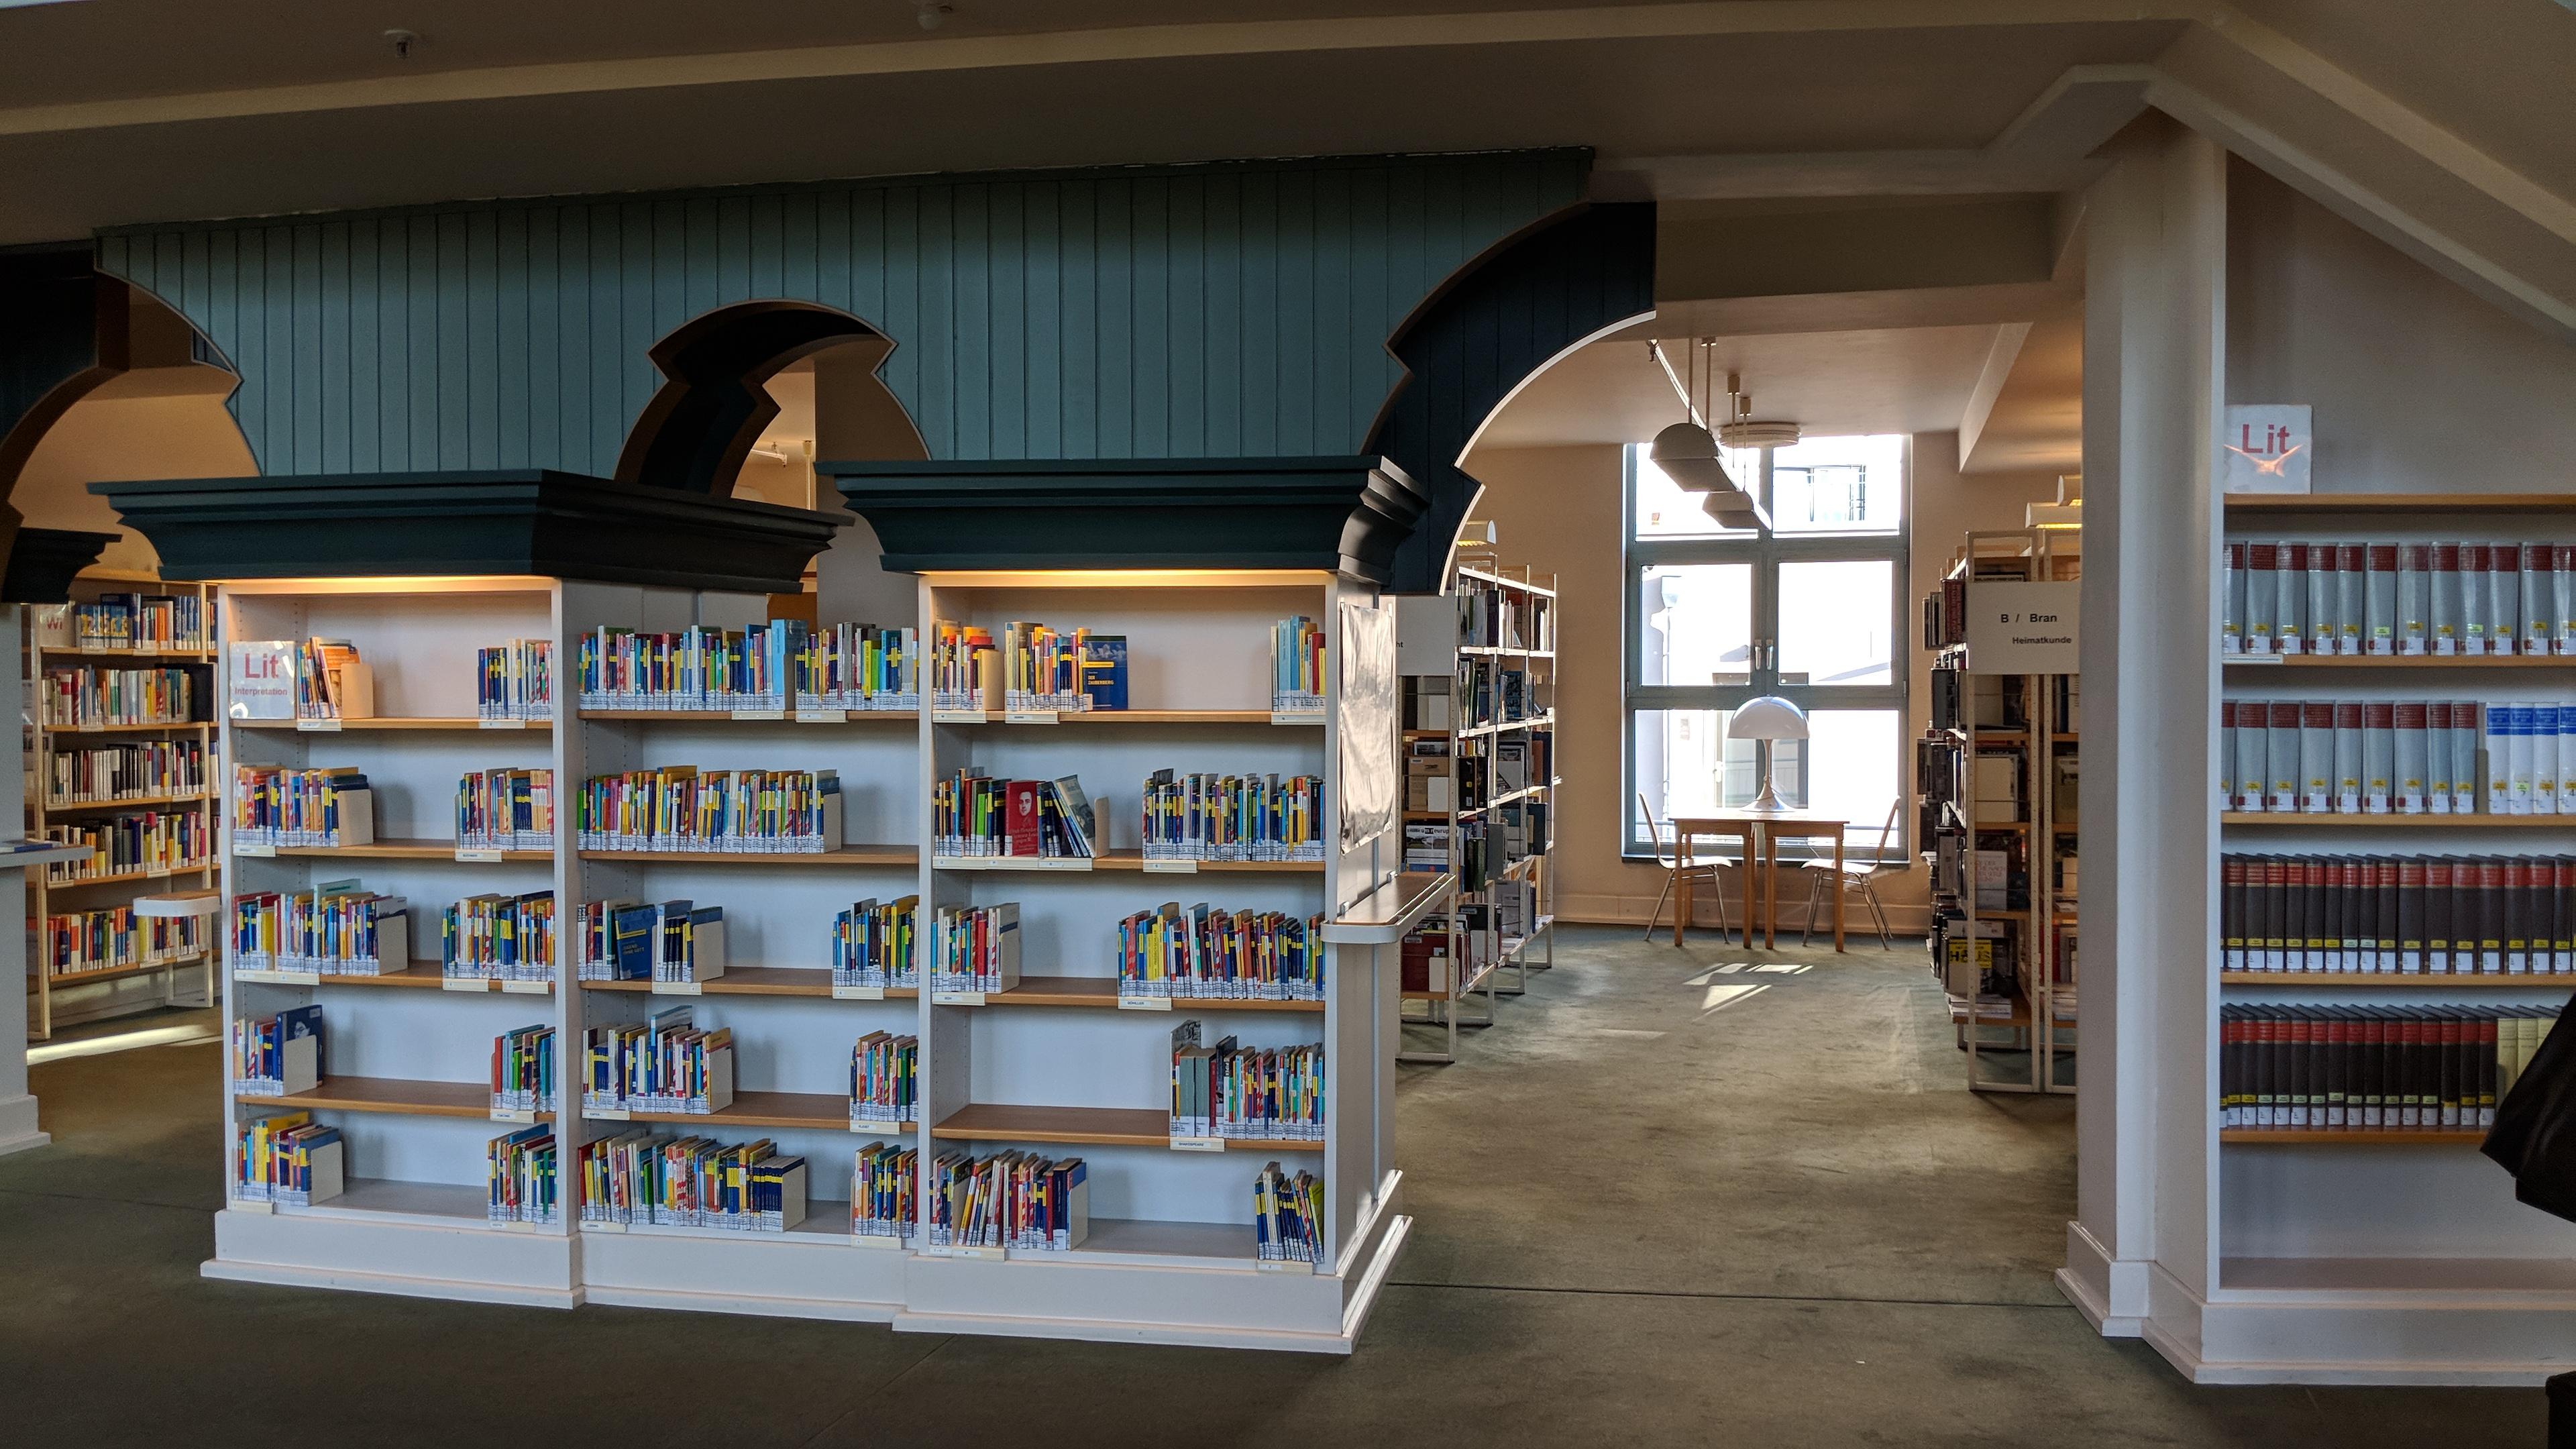 Bücherregale in der Humboldt-Bibliothek in Tegel.